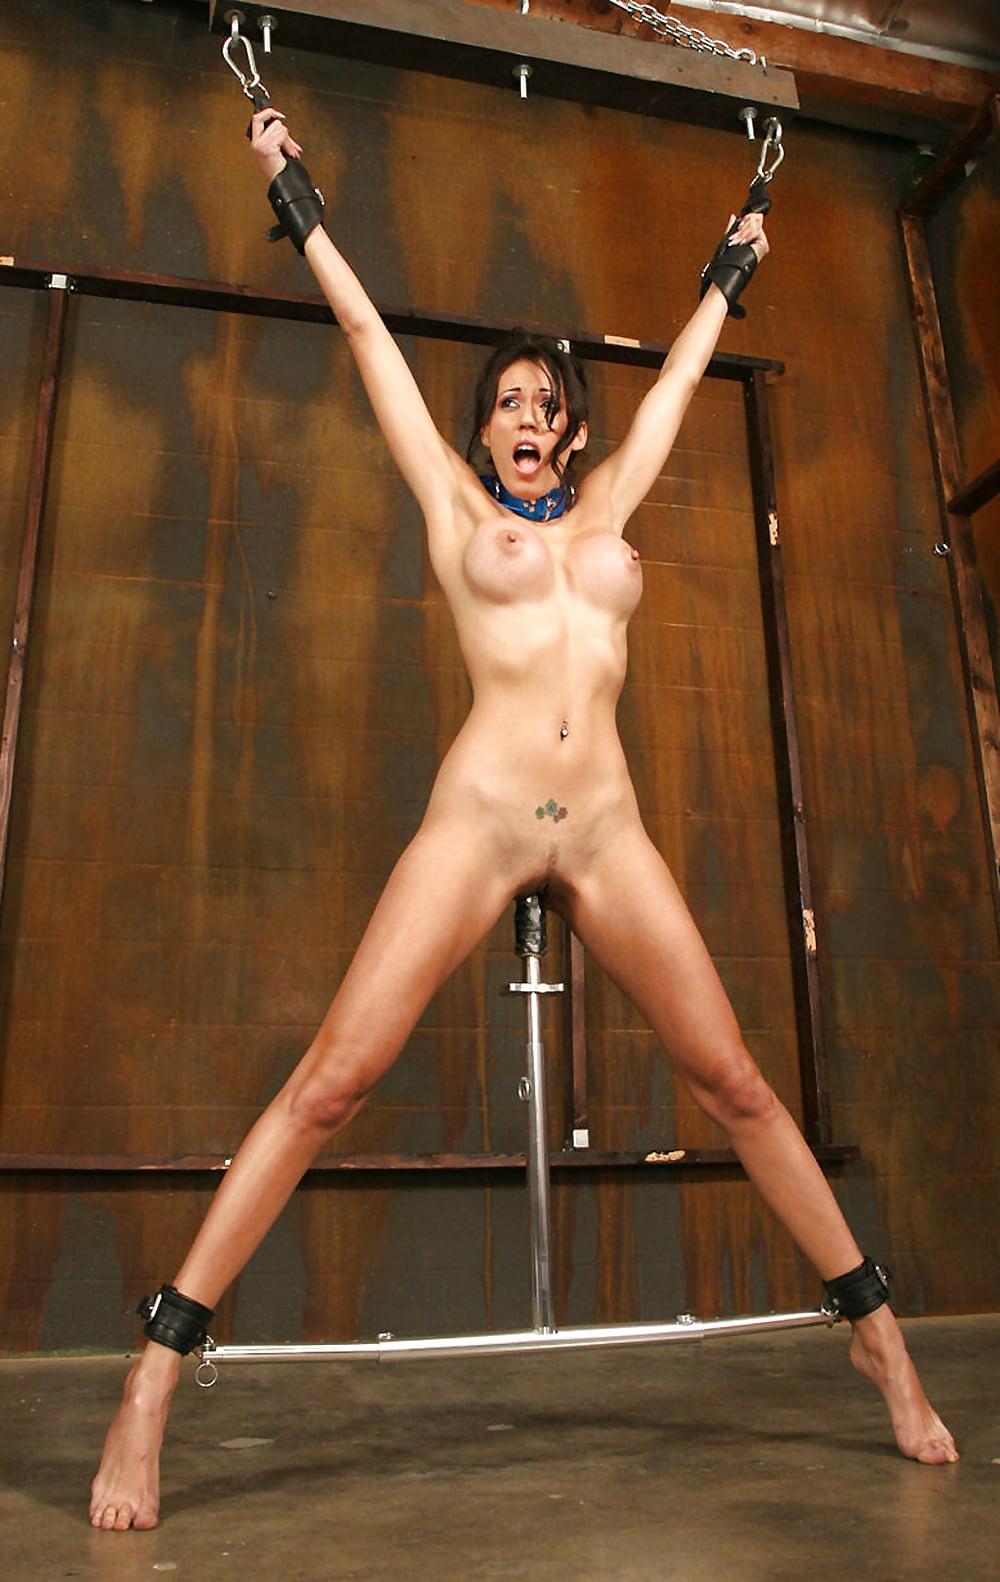 woman-in-spreader-bar-porn-shyla-jennings